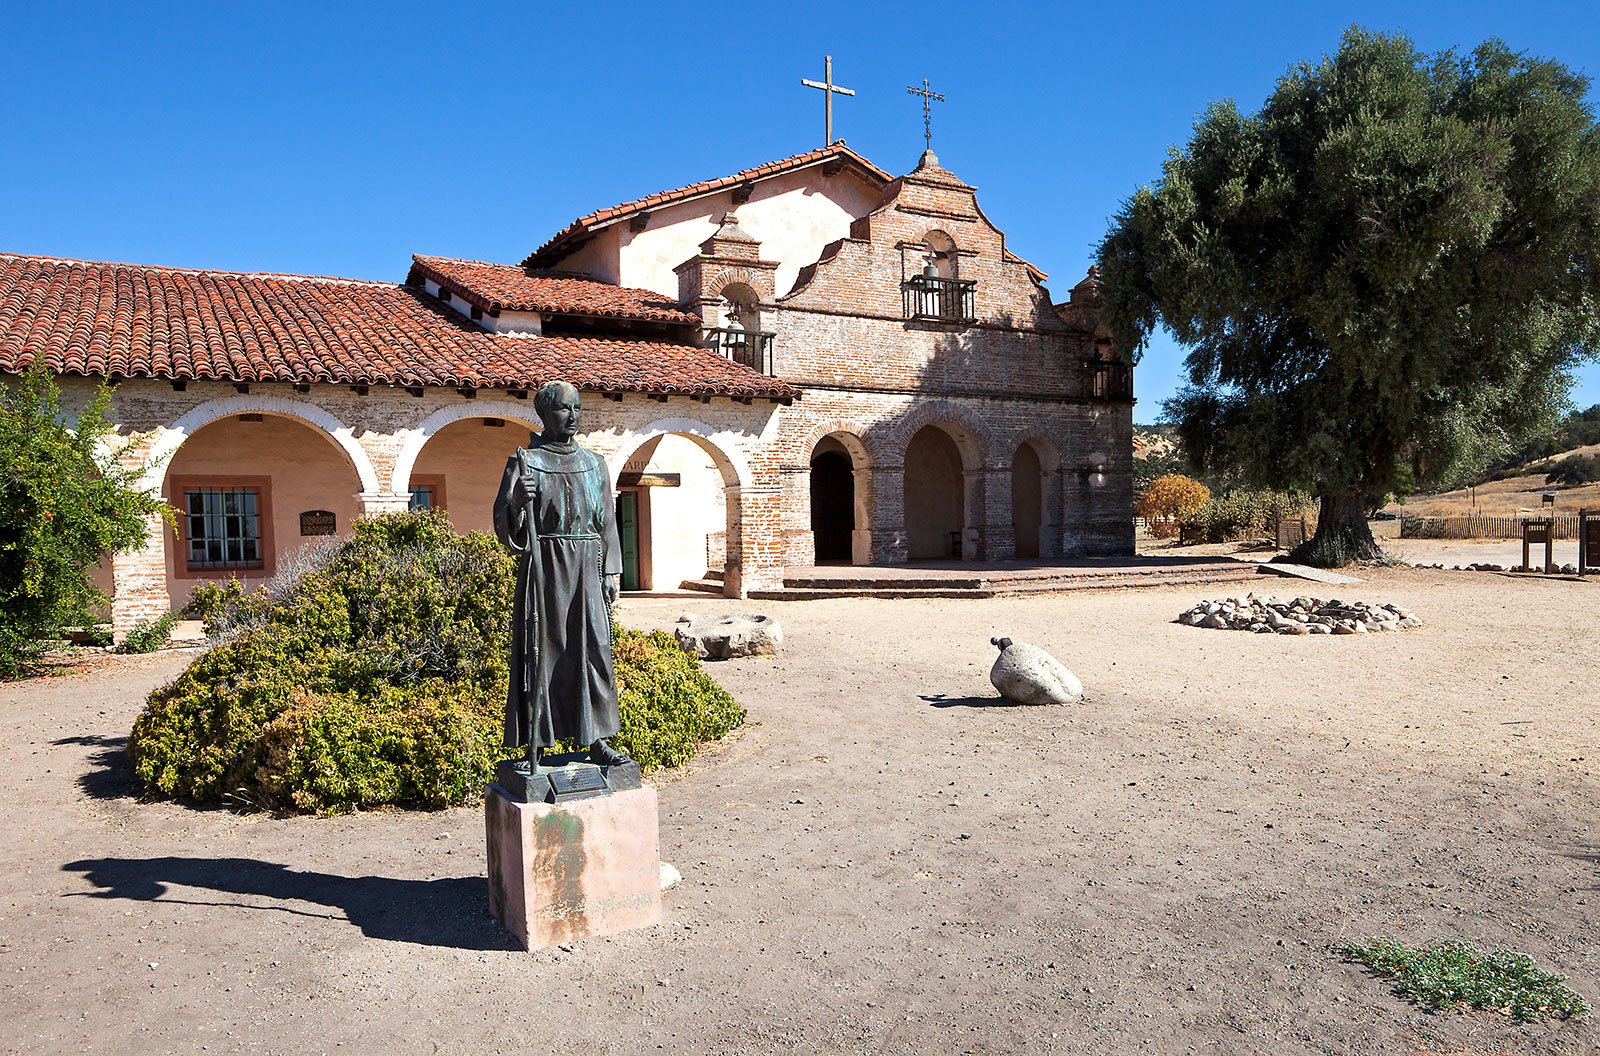 San Antonio de Padua - California Mission Guide